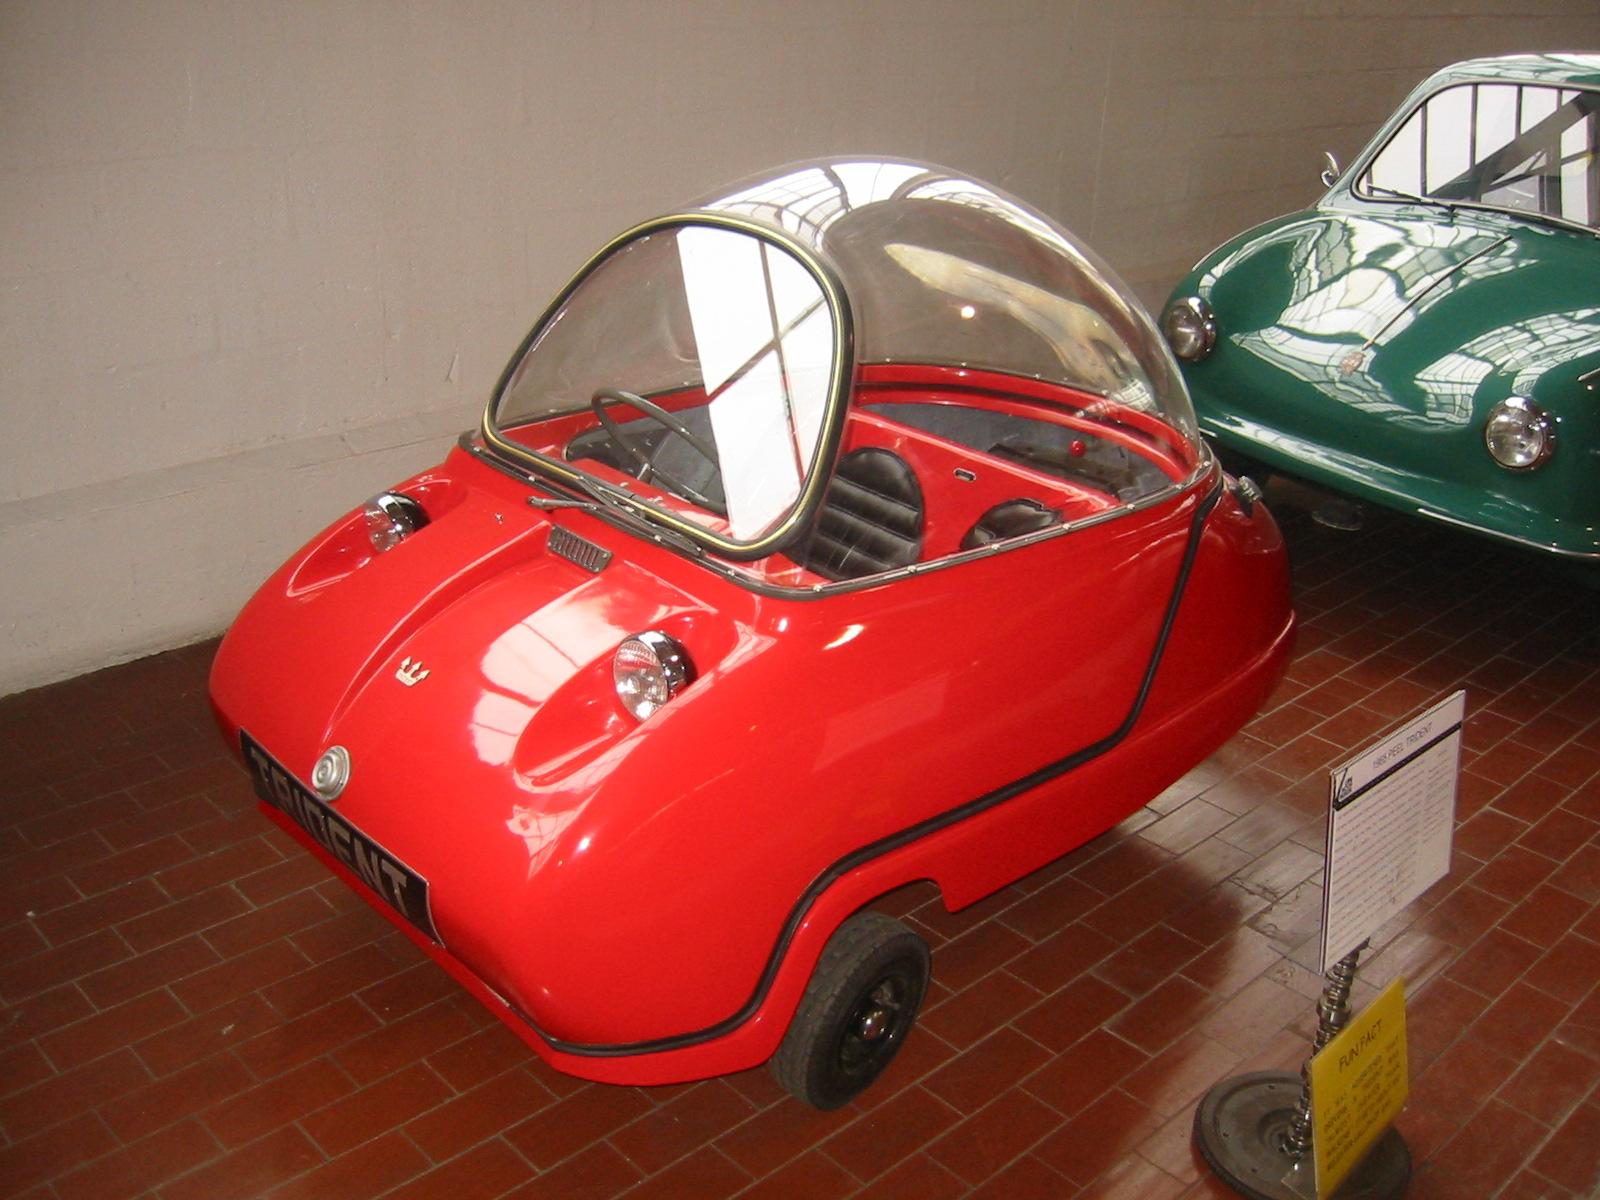 1965 Peel Trident (Lane Motor Museum).jpg